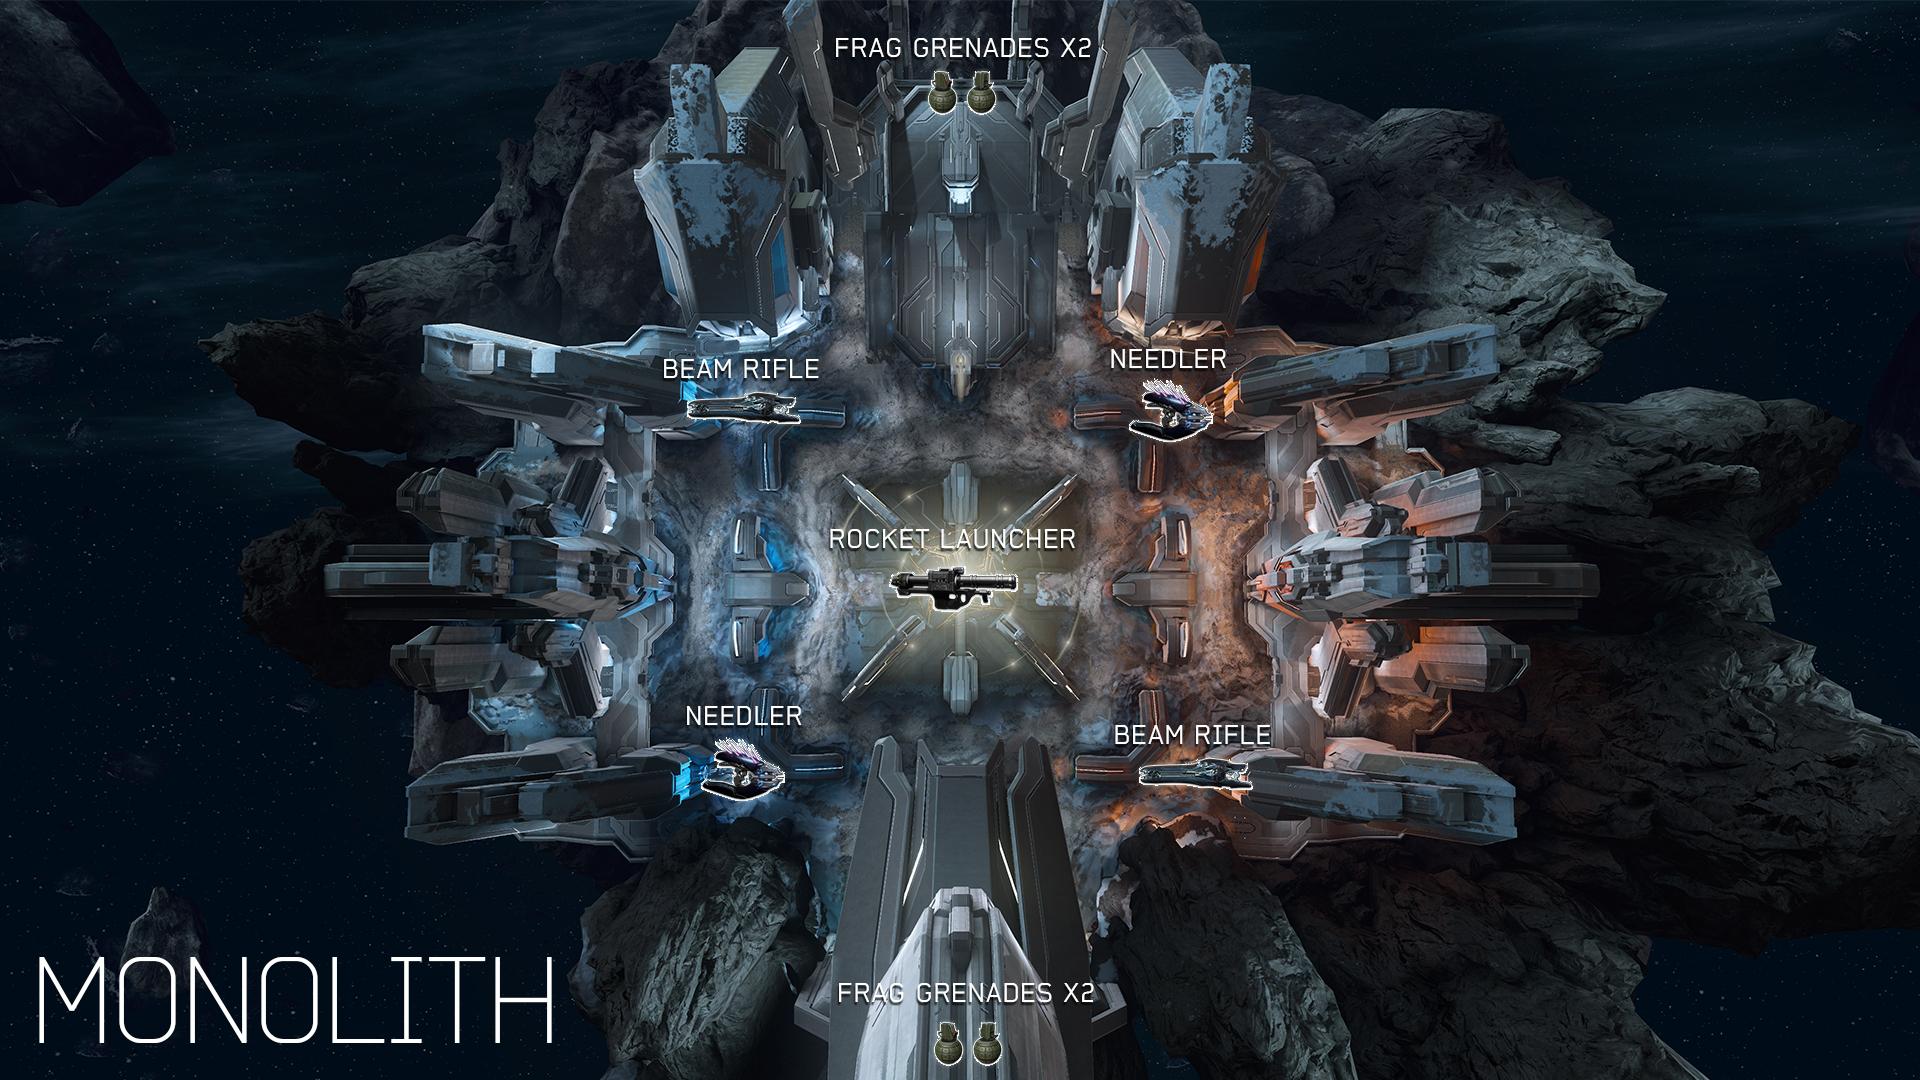 Halo 4 Majestic Map Pack Details: Monolith - Halo Diehards